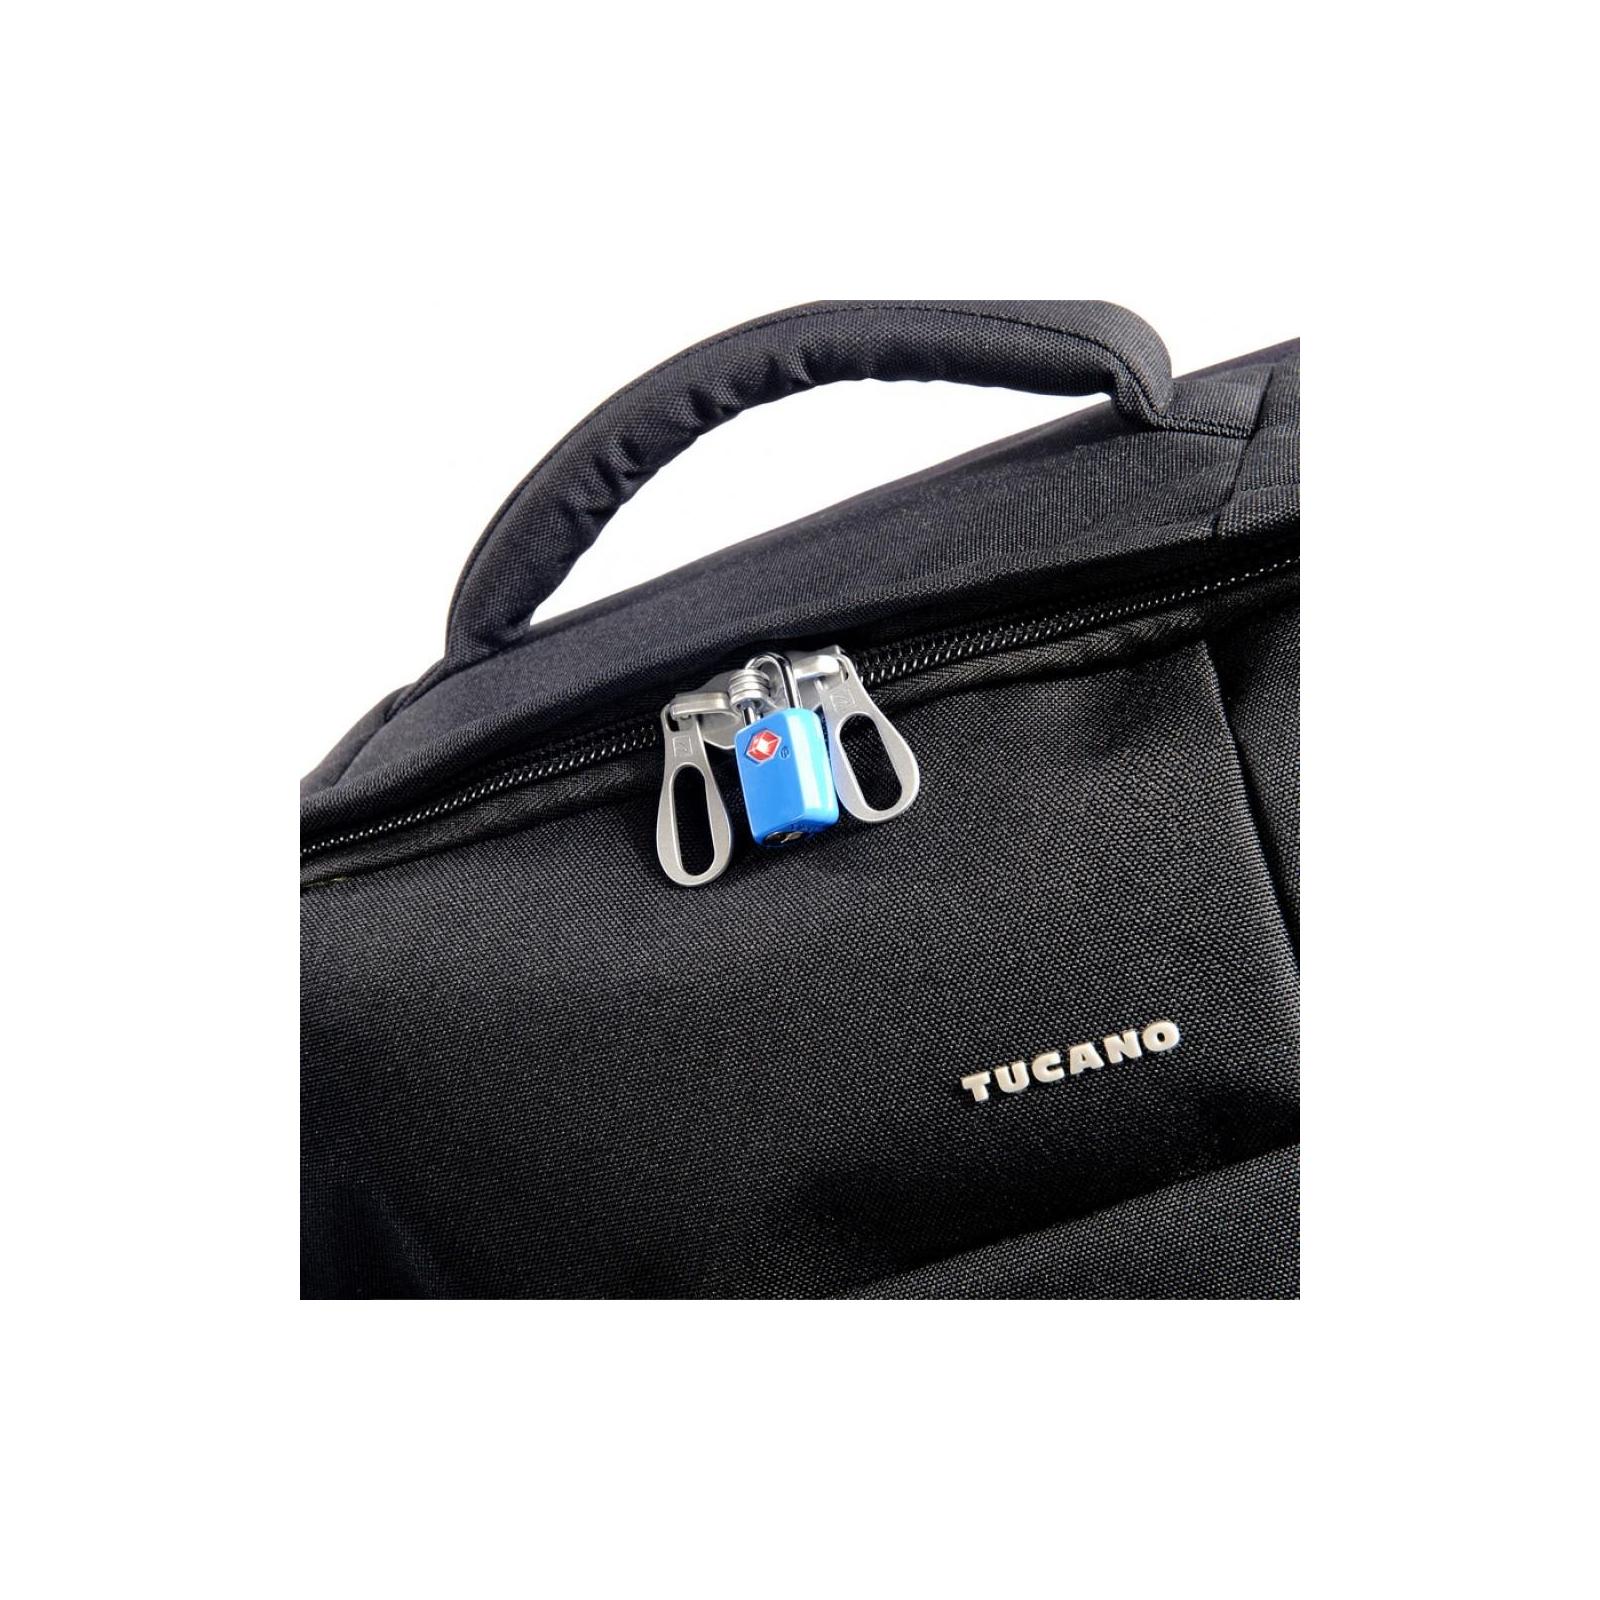 "Рюкзак для ноутбука Tucano 17.3"" TUGO' L CABIN black (BKTUG-L-BK) изображение 6"